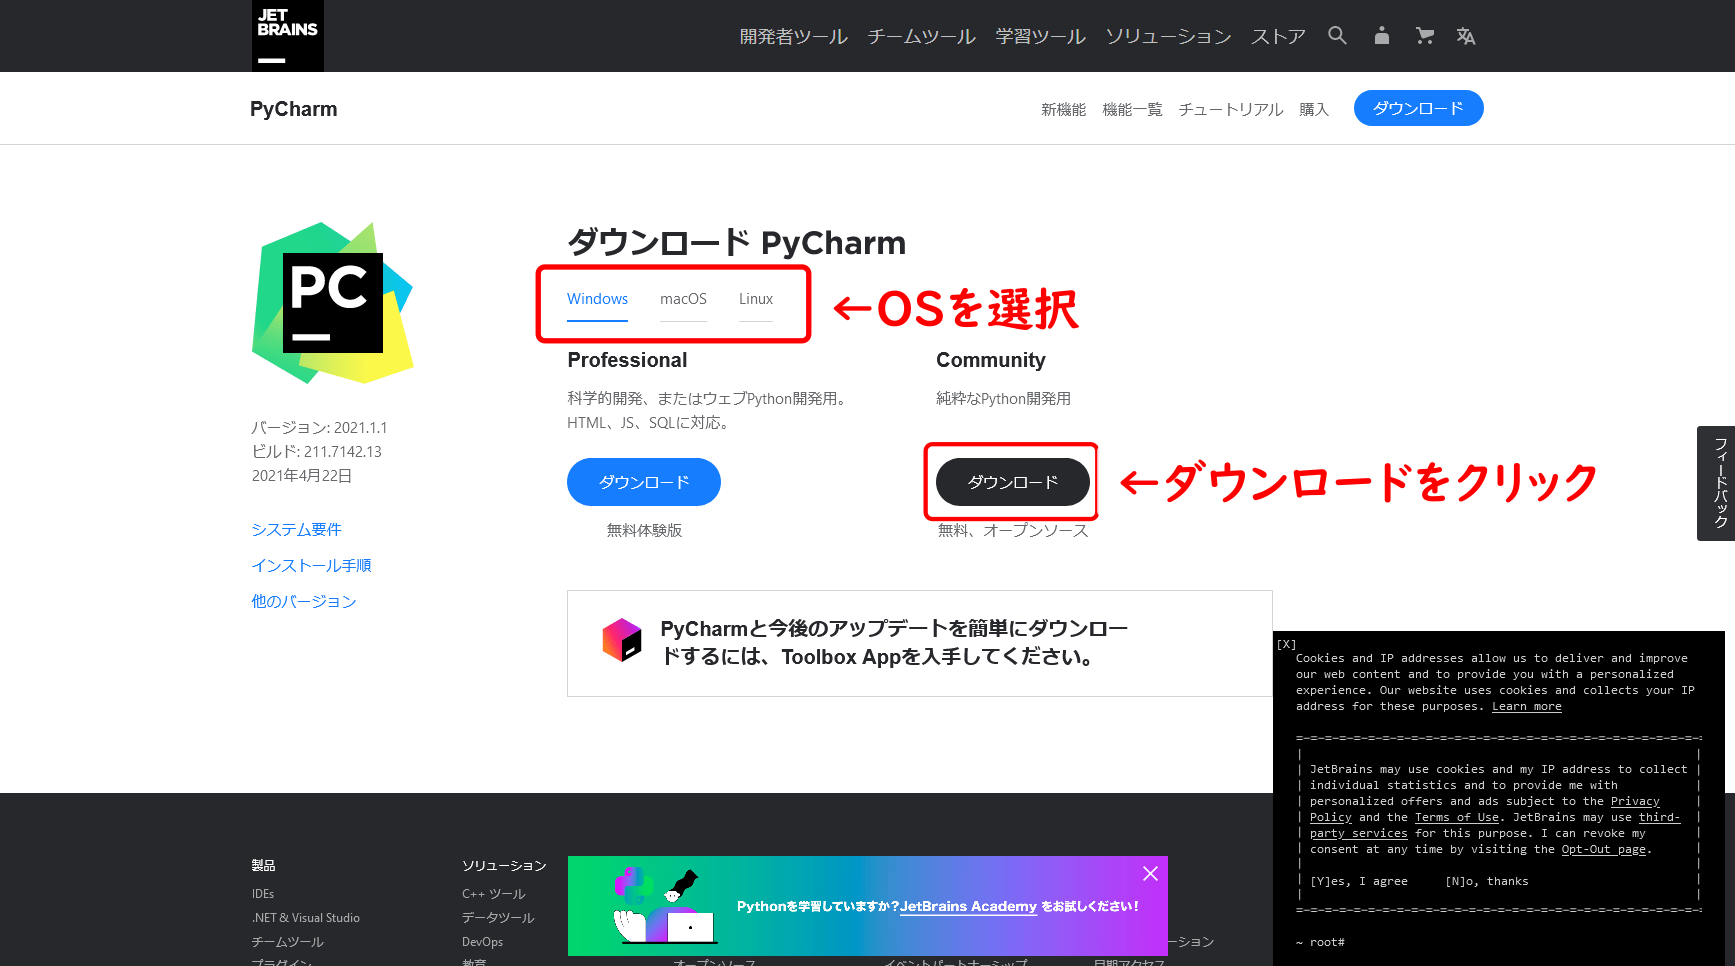 PyCharmのダウンロード画面